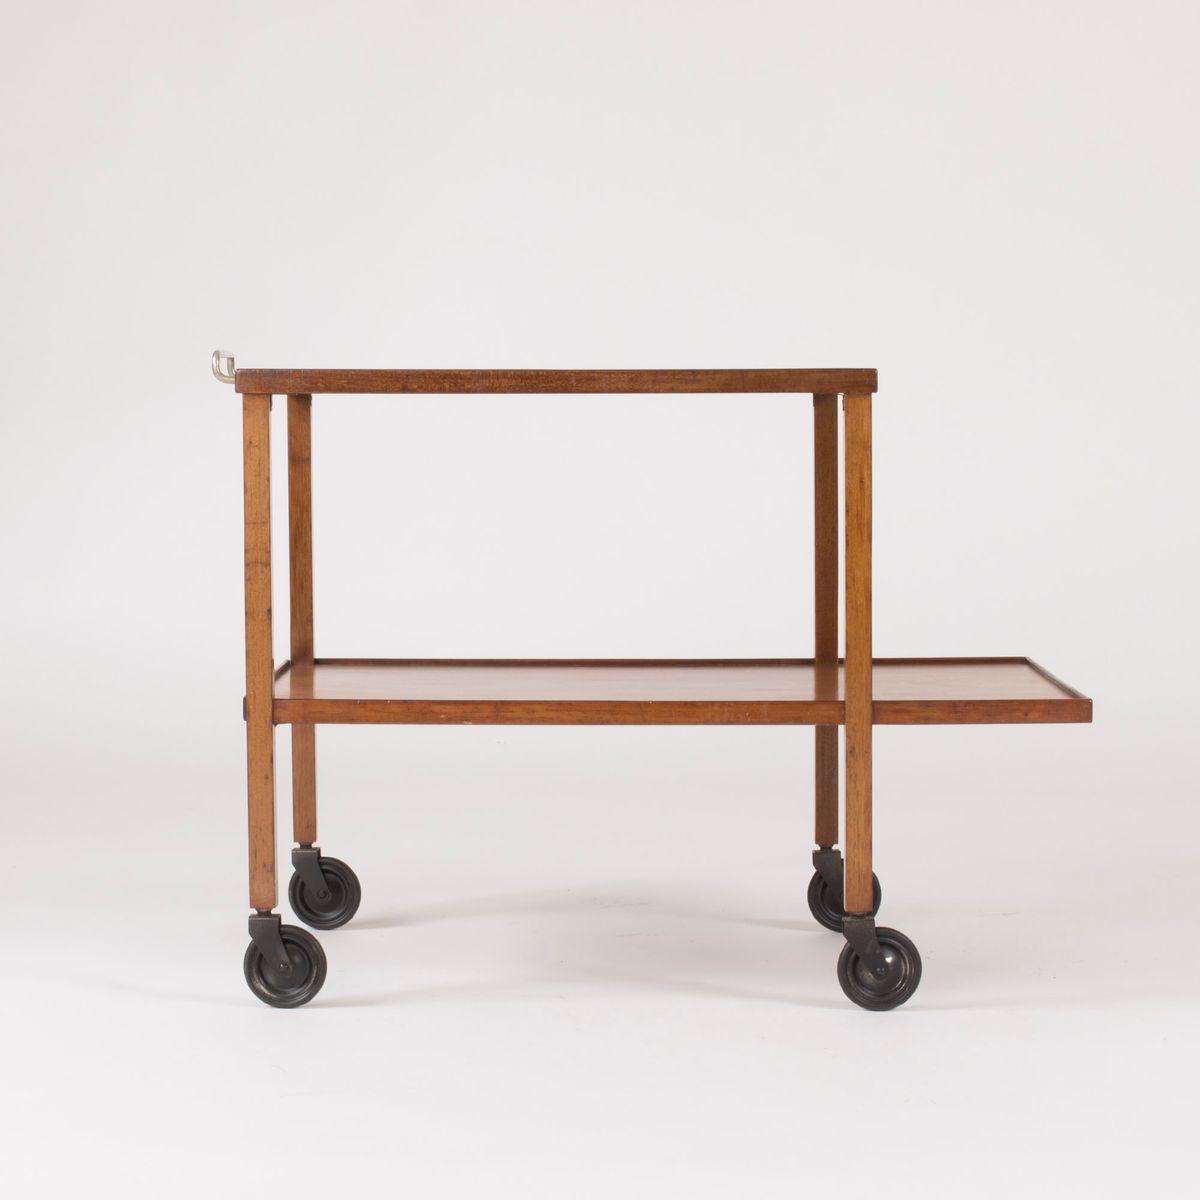 chariot bar en acajou par josef frank pour svenskt tenn 1950s en vente sur pamono. Black Bedroom Furniture Sets. Home Design Ideas